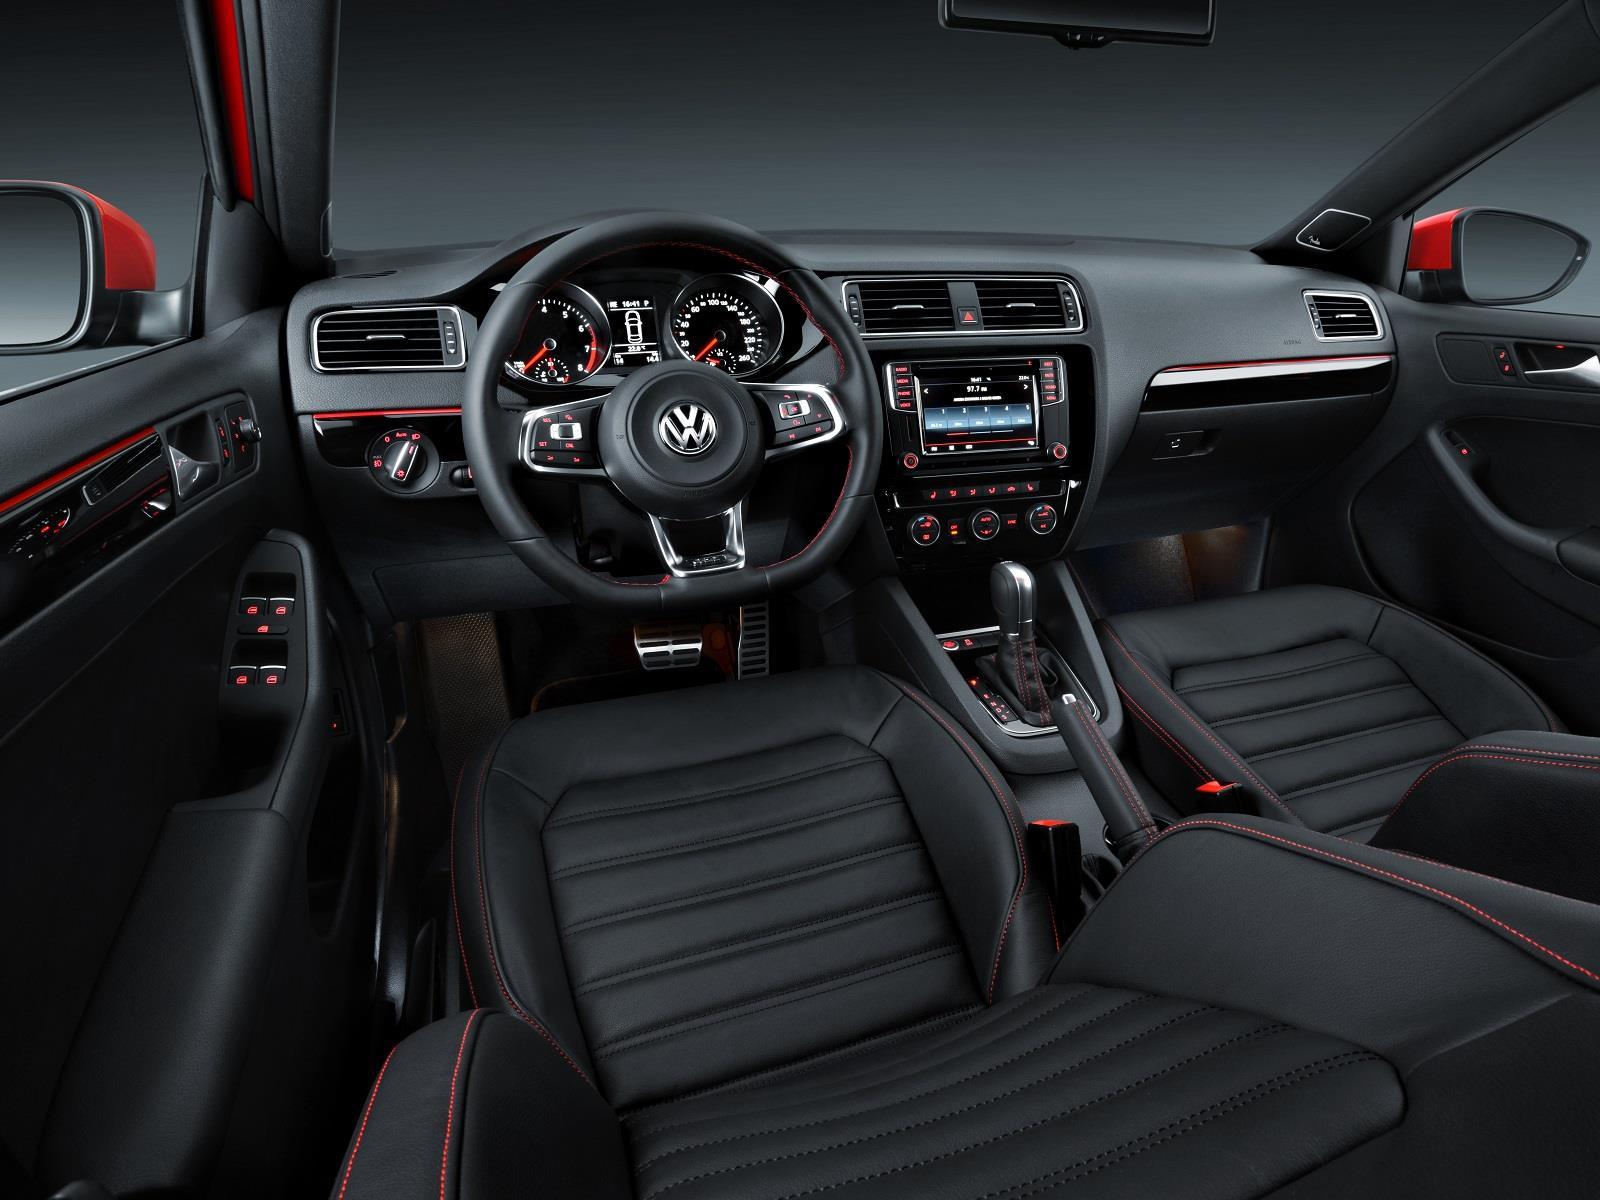 Volkswagen Jetta Gli 2016 Llega A M Xico Desde 403 700 Pesos